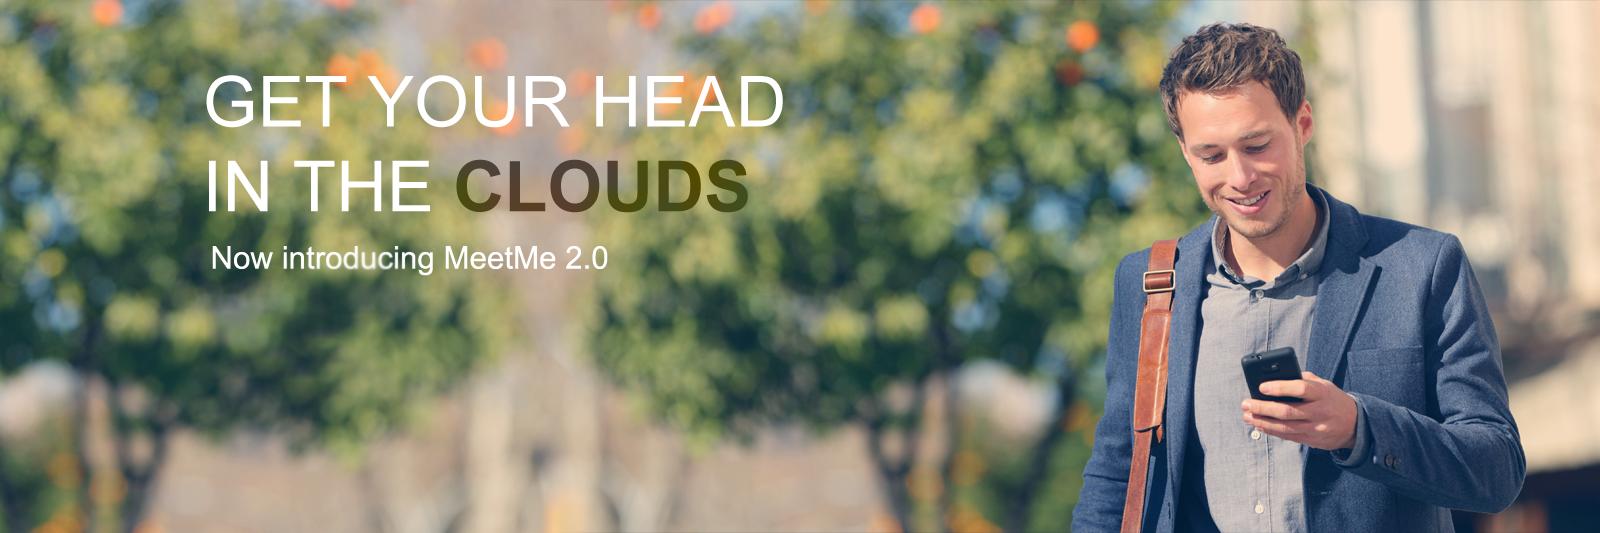 prime-call-cloud-meetme.jpg